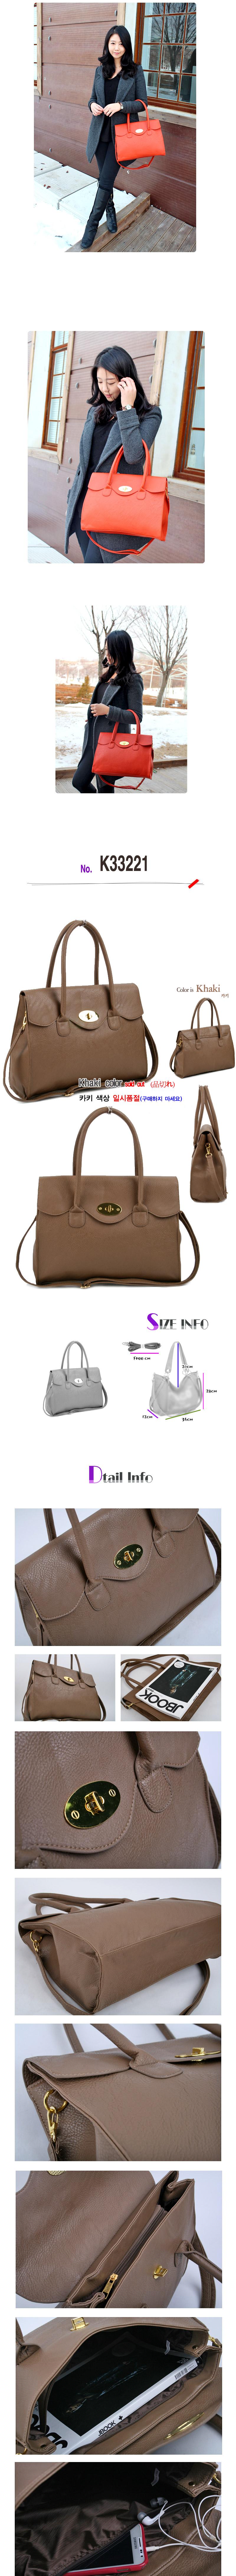 Shoulder&tote bag no. K18200view